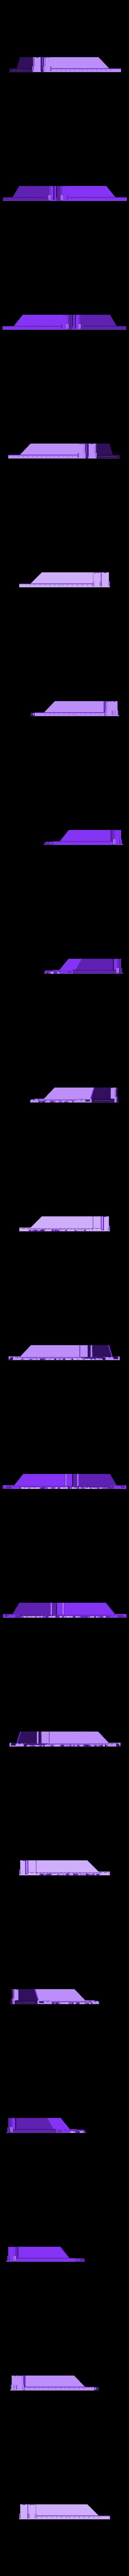 fixation_bottom_2nd_floor_v3.stl Download free STL file Damocles kickstarter modular industrial buildings sample • 3D print design, Alario